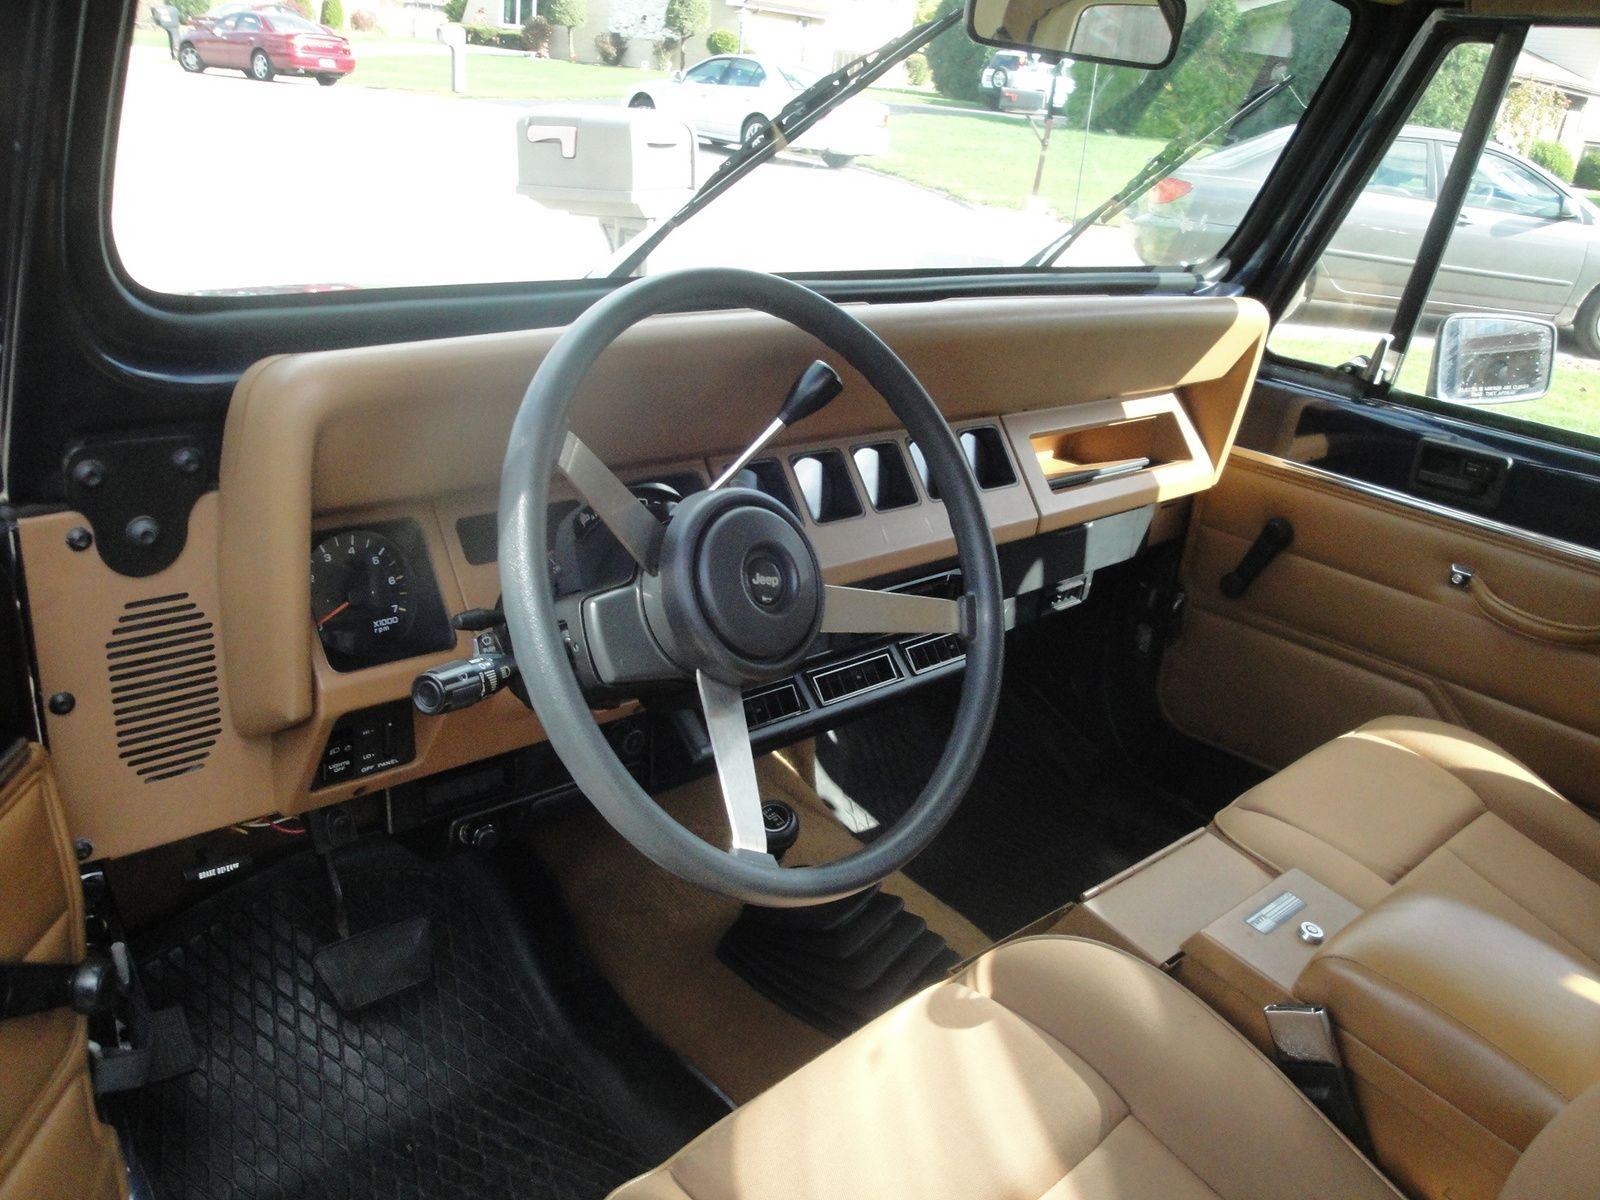 1995 Jeep Wrangler Interior Pictures Jeep Wrangler Interior